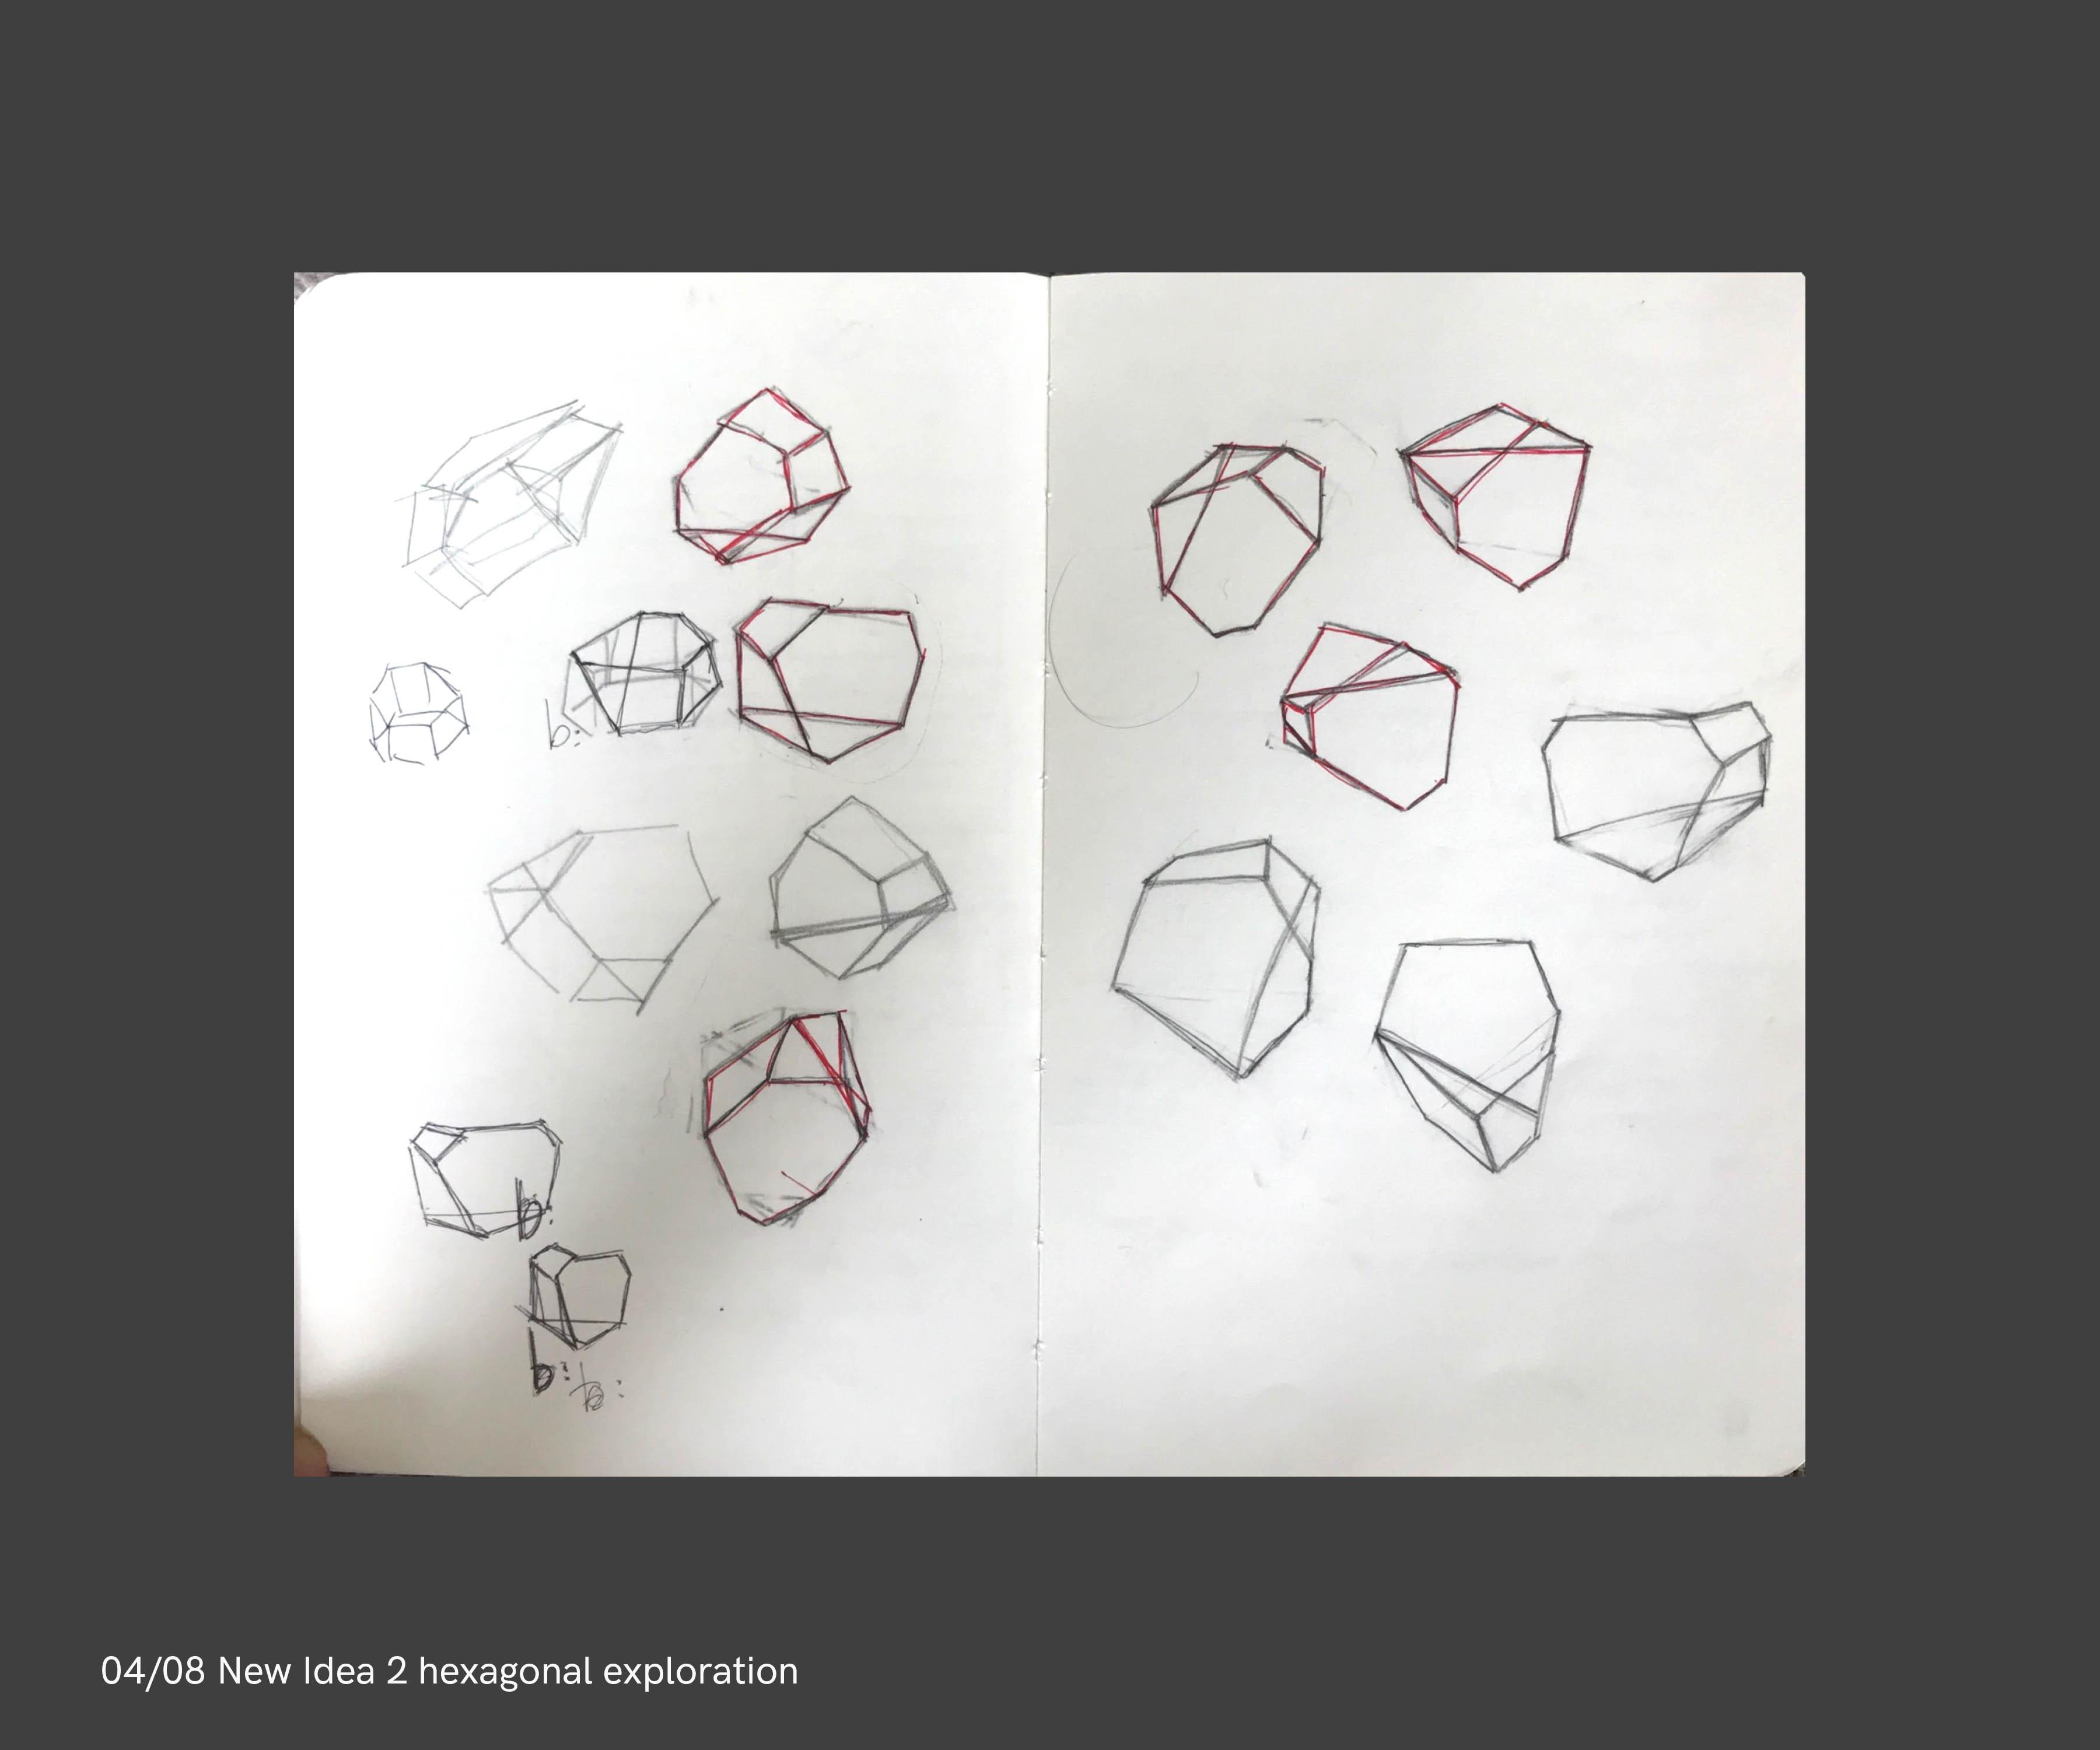 b_process_logo2_sketches-4.1